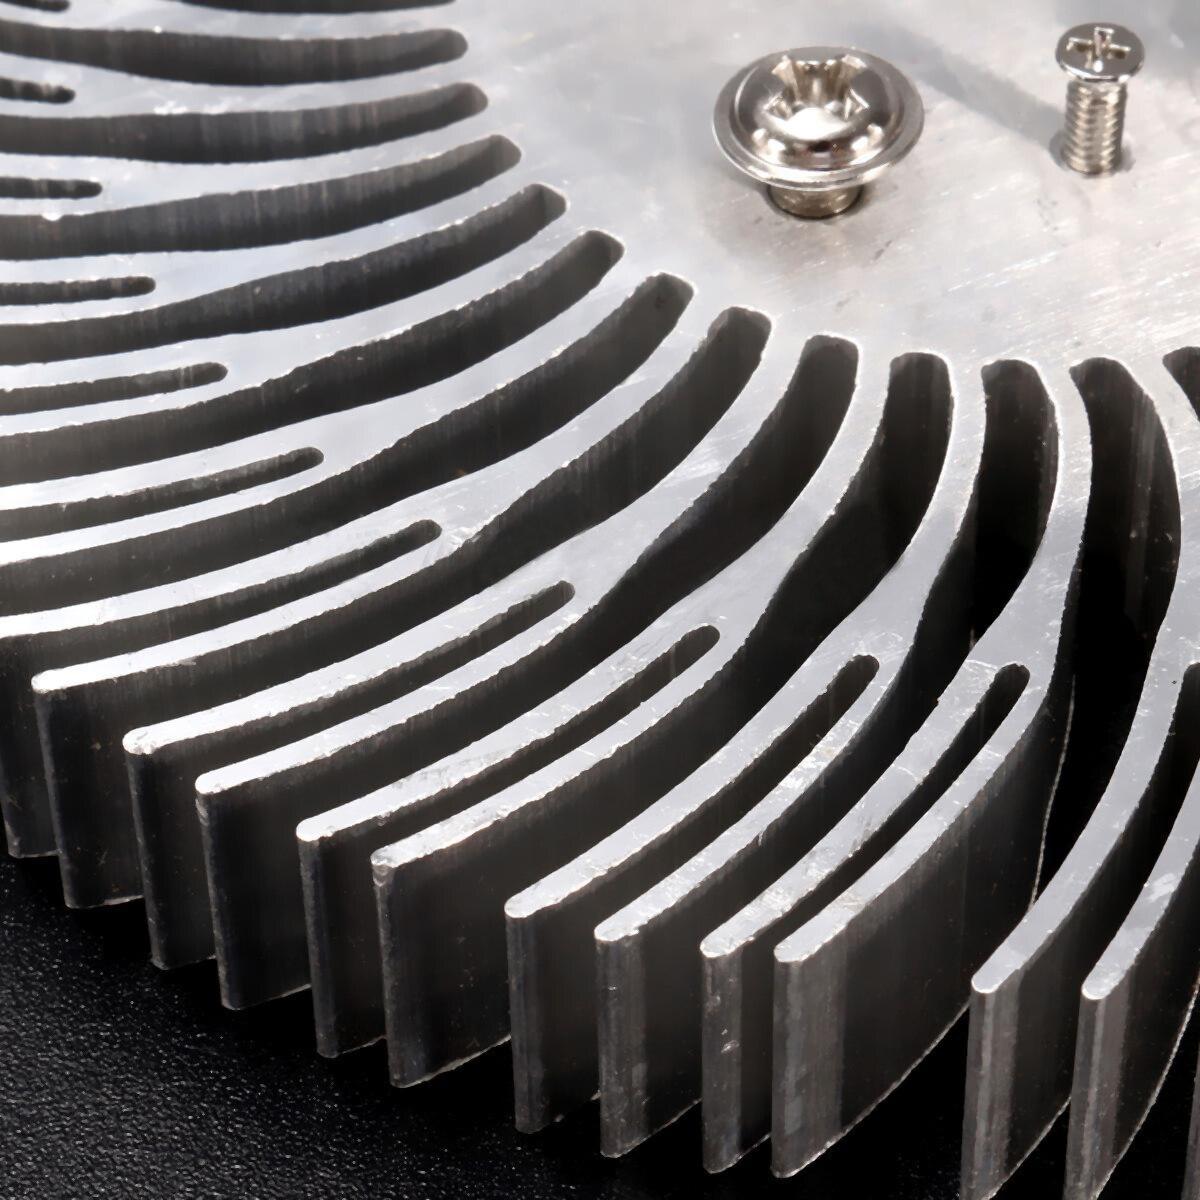 High Quality Aluminum Heatsink Radiator 90*10mm For 10W High Power LED Lamp Light Round Spiral Heat Sink with Screws